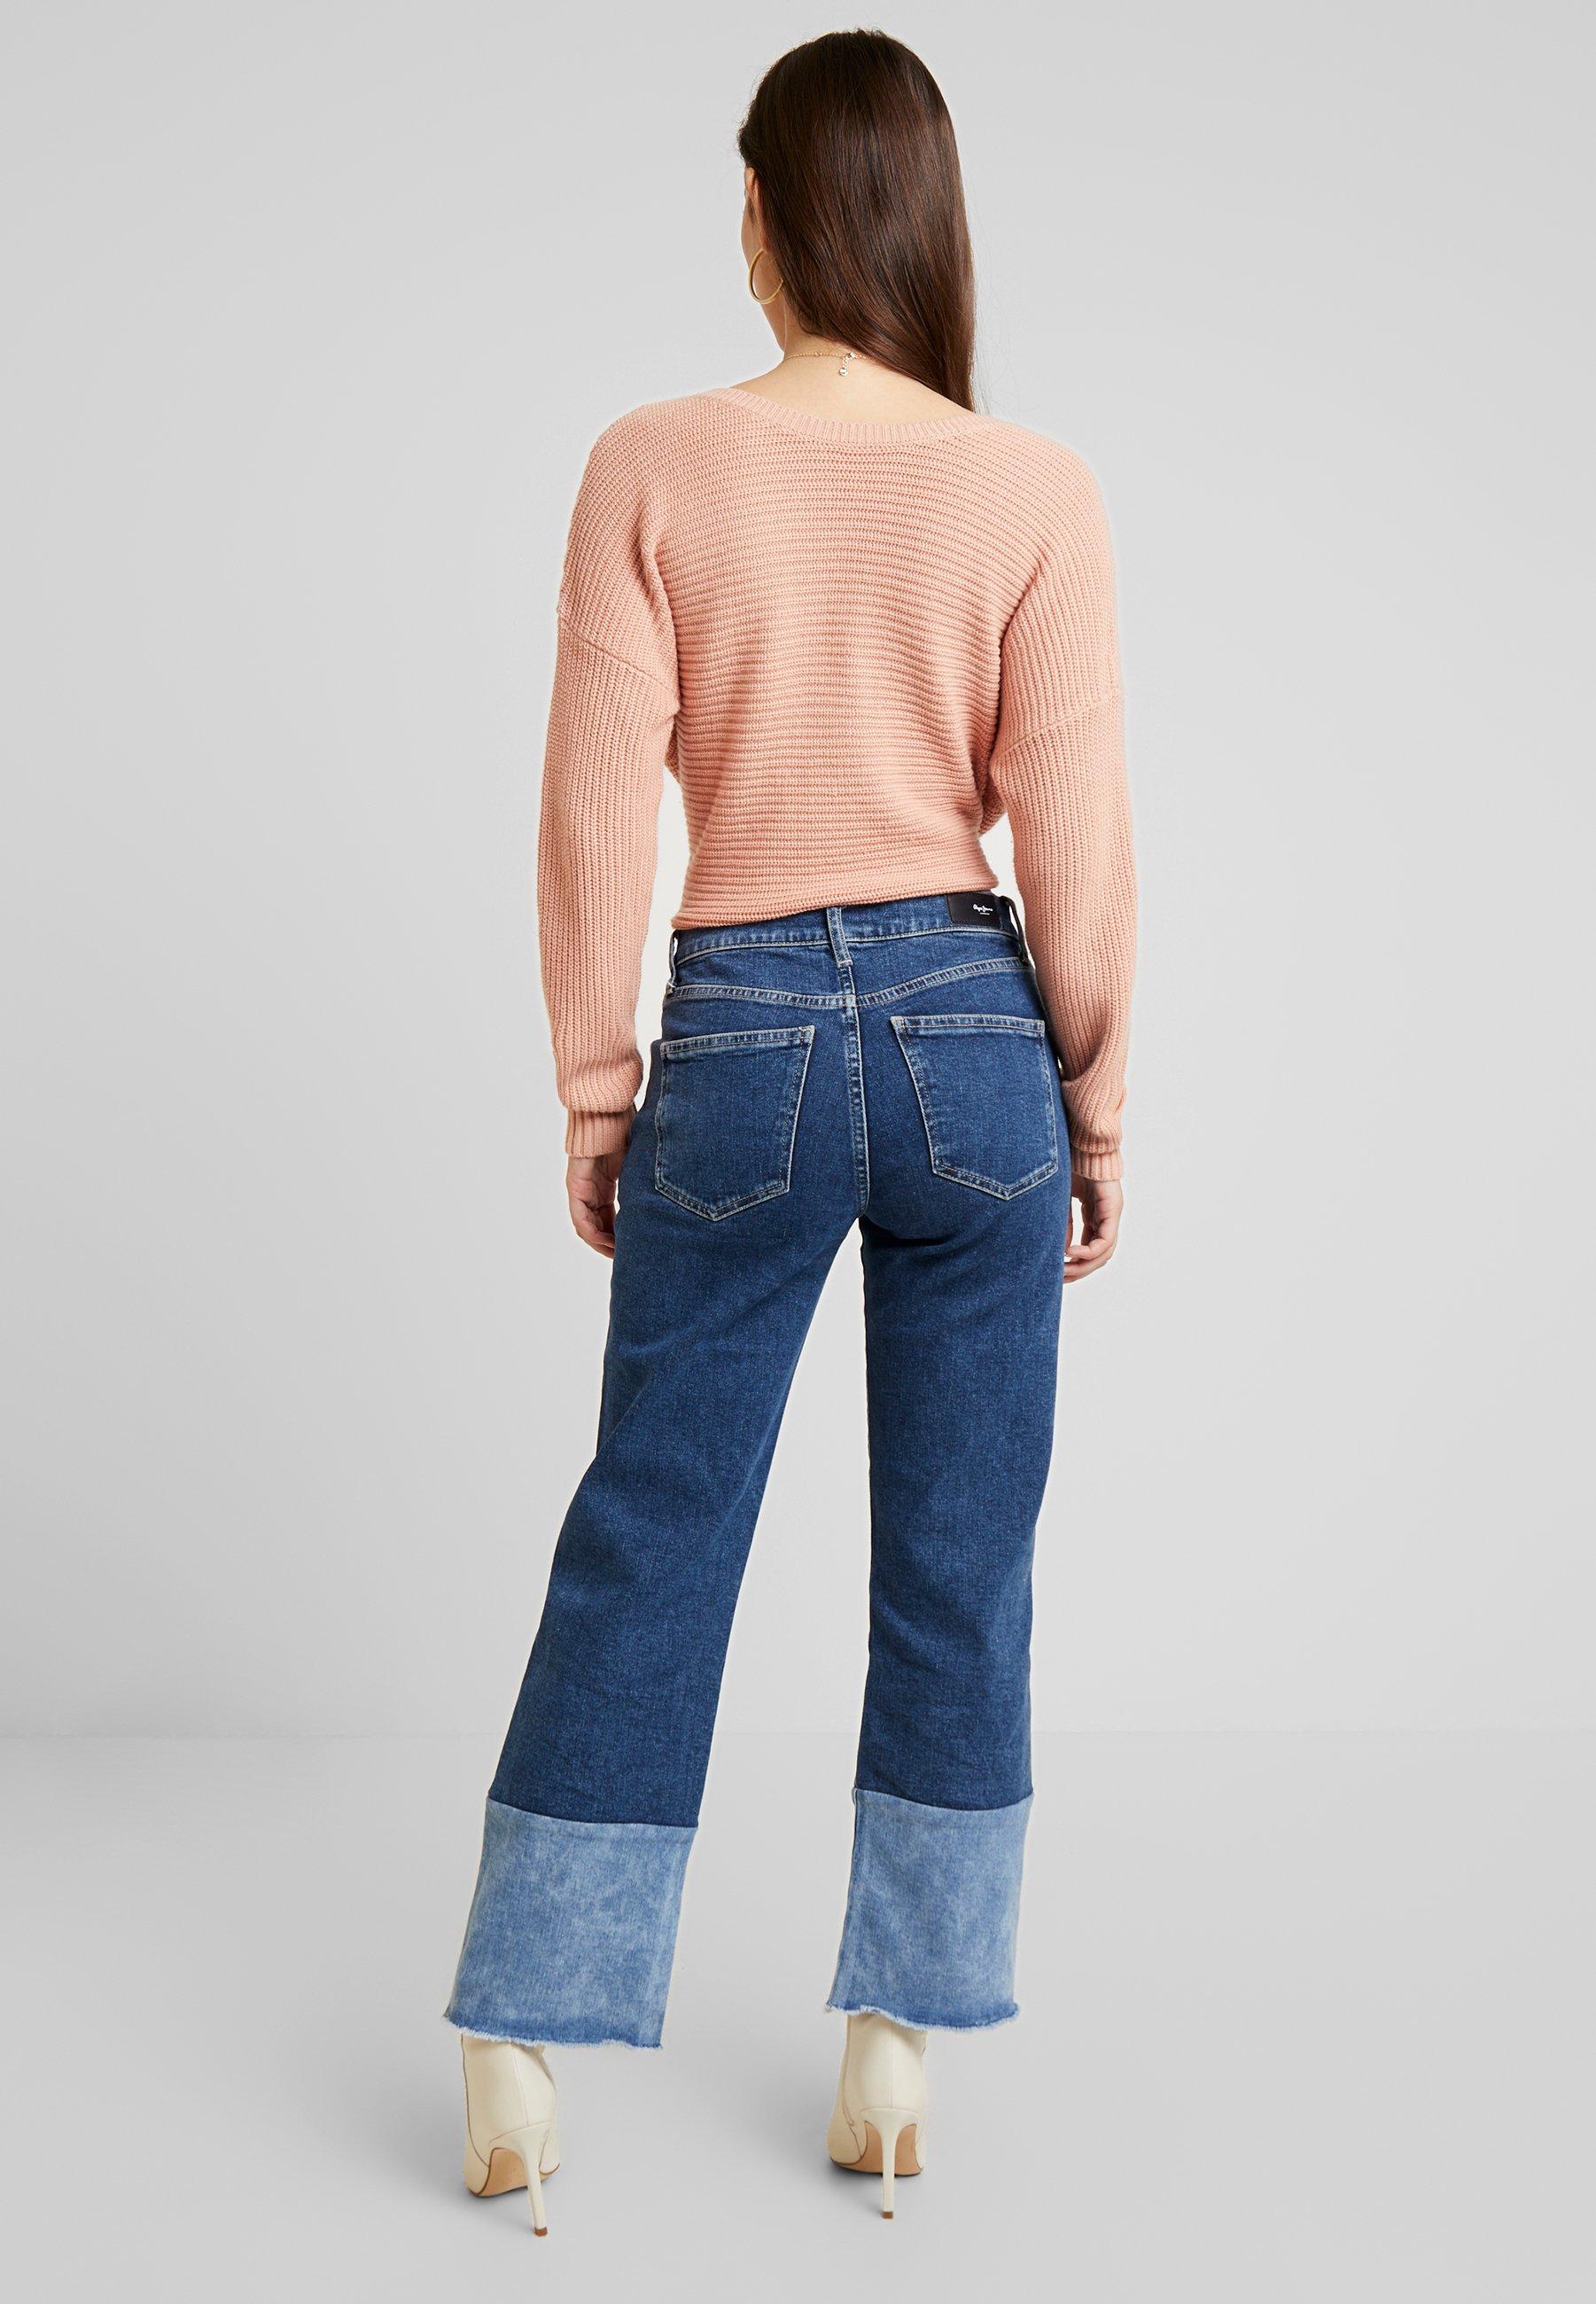 Denim Jeans GraceJean Droit Pepe GraceJean Pepe GraceJean Denim Pepe Jeans Droit Jeans TF5Julc3K1